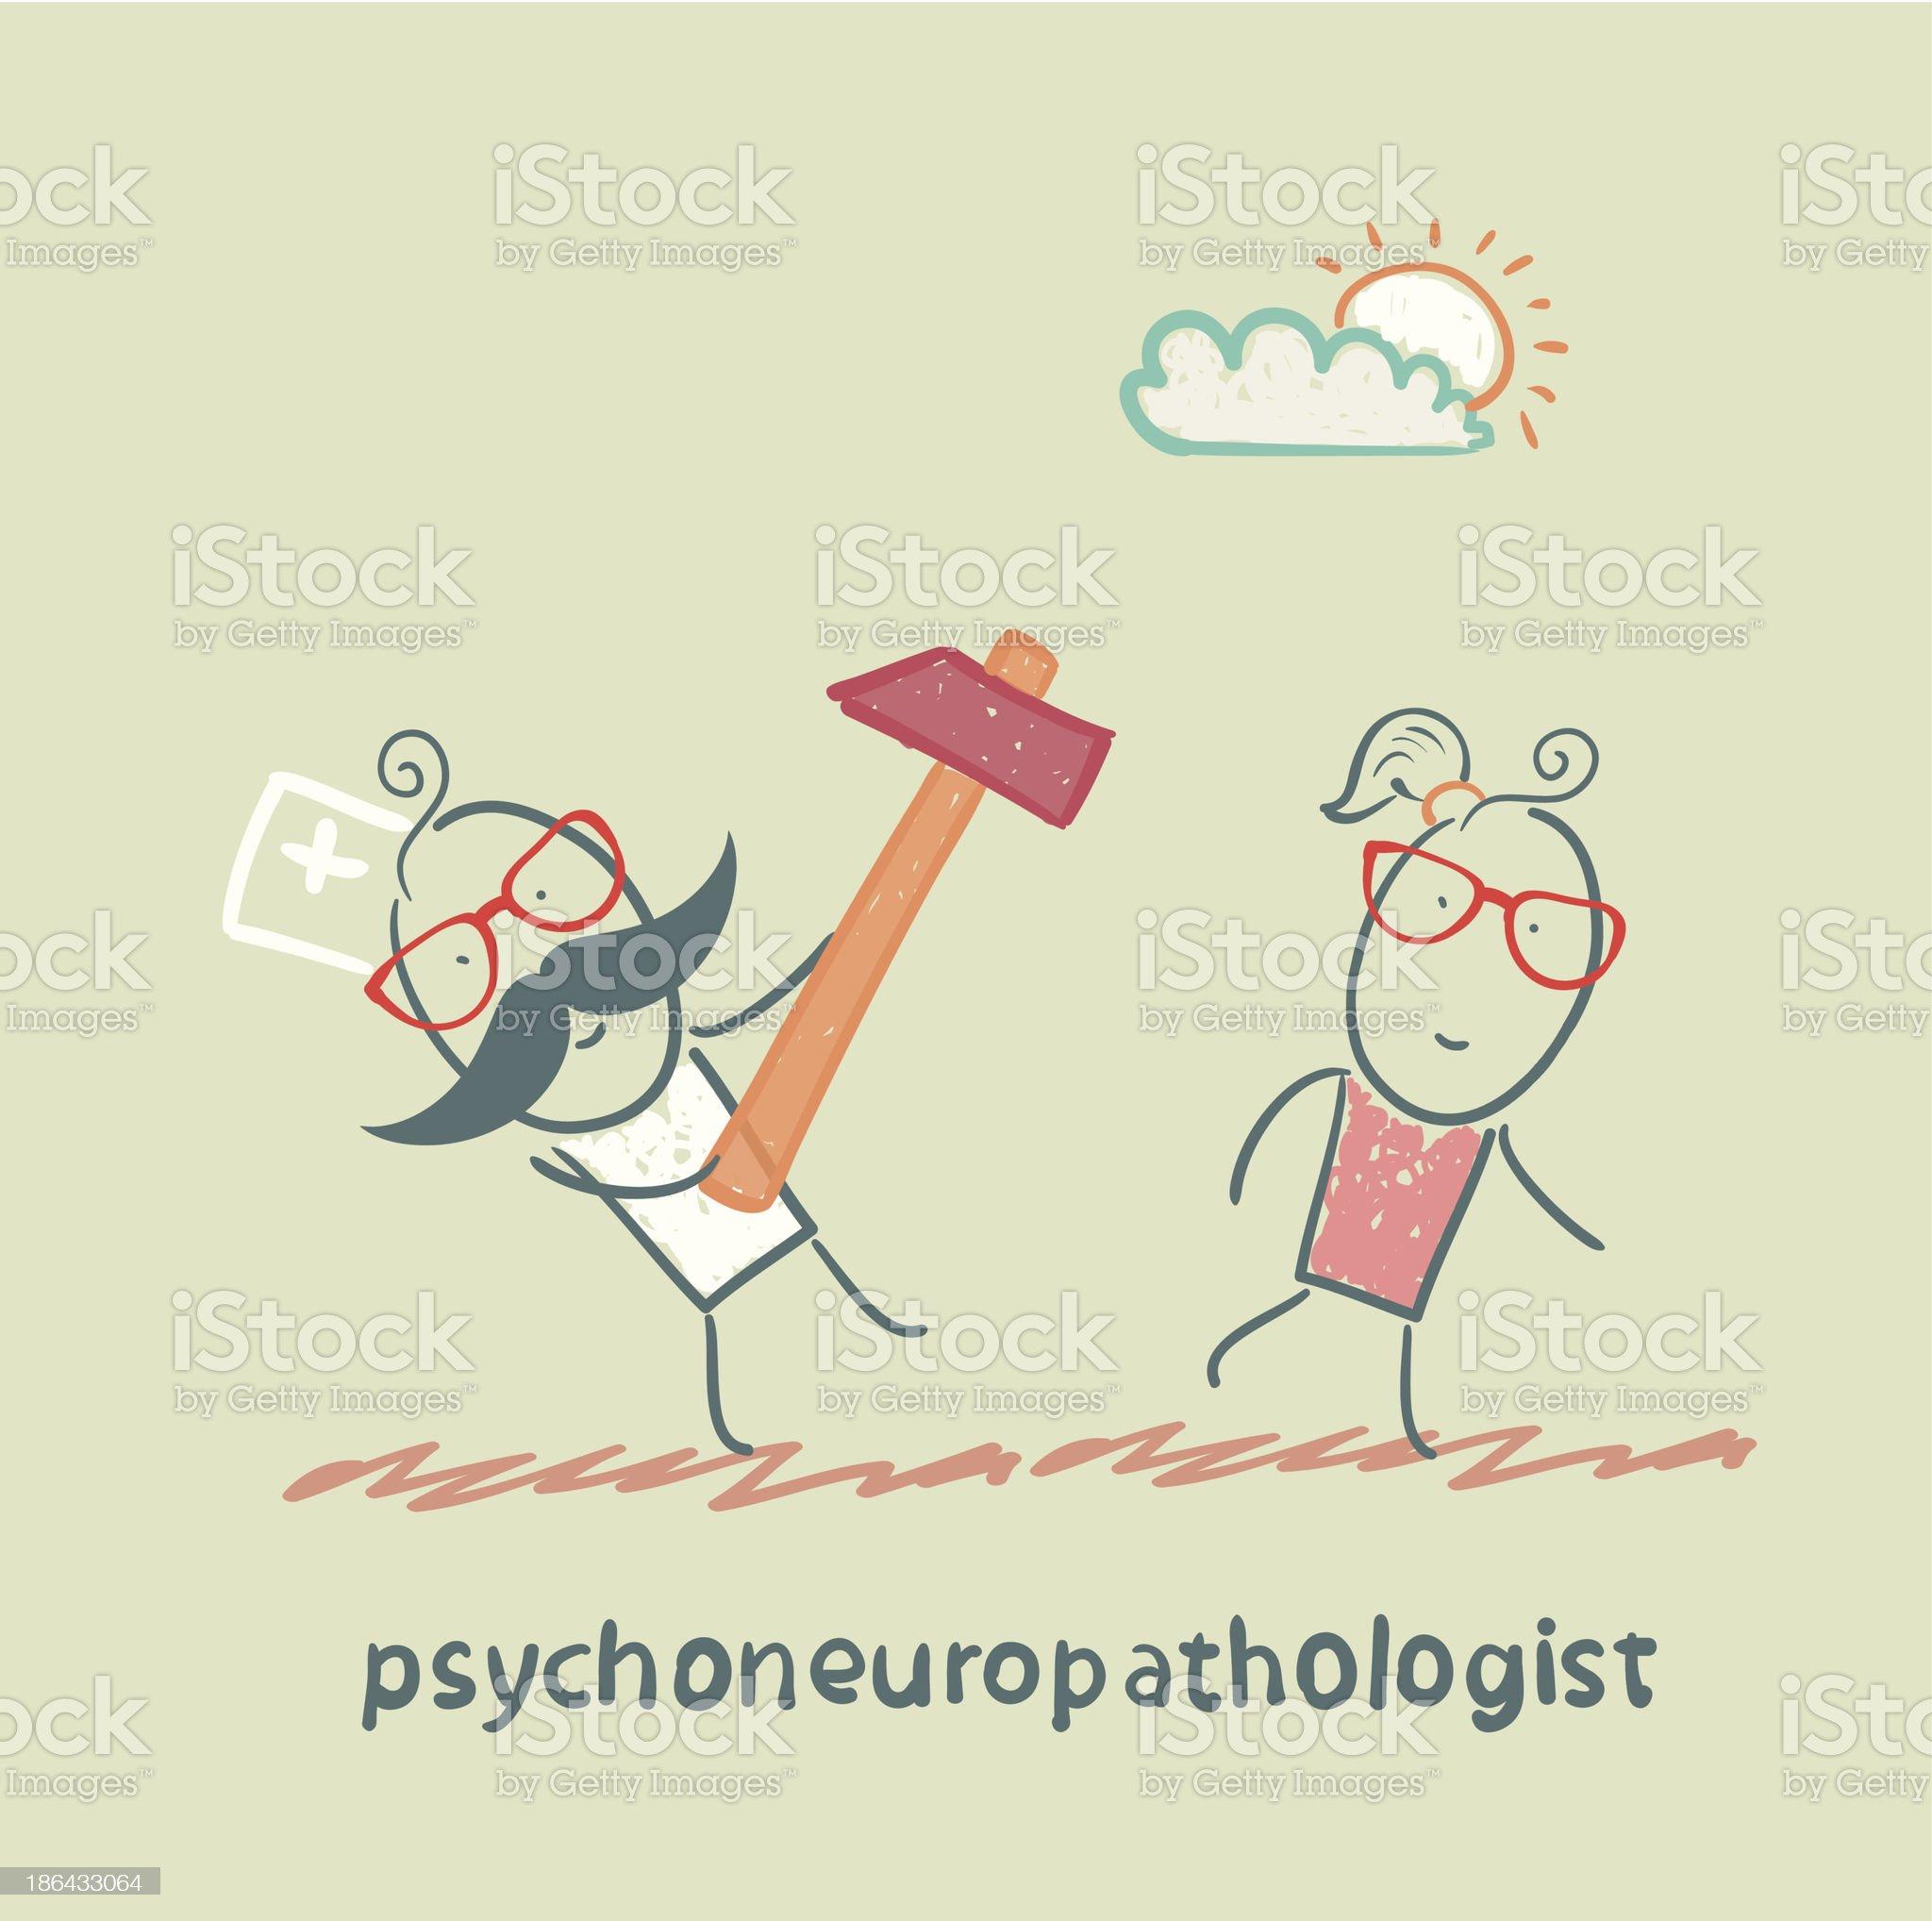 psychoneuropathologist runs with a hammer royalty-free stock vector art